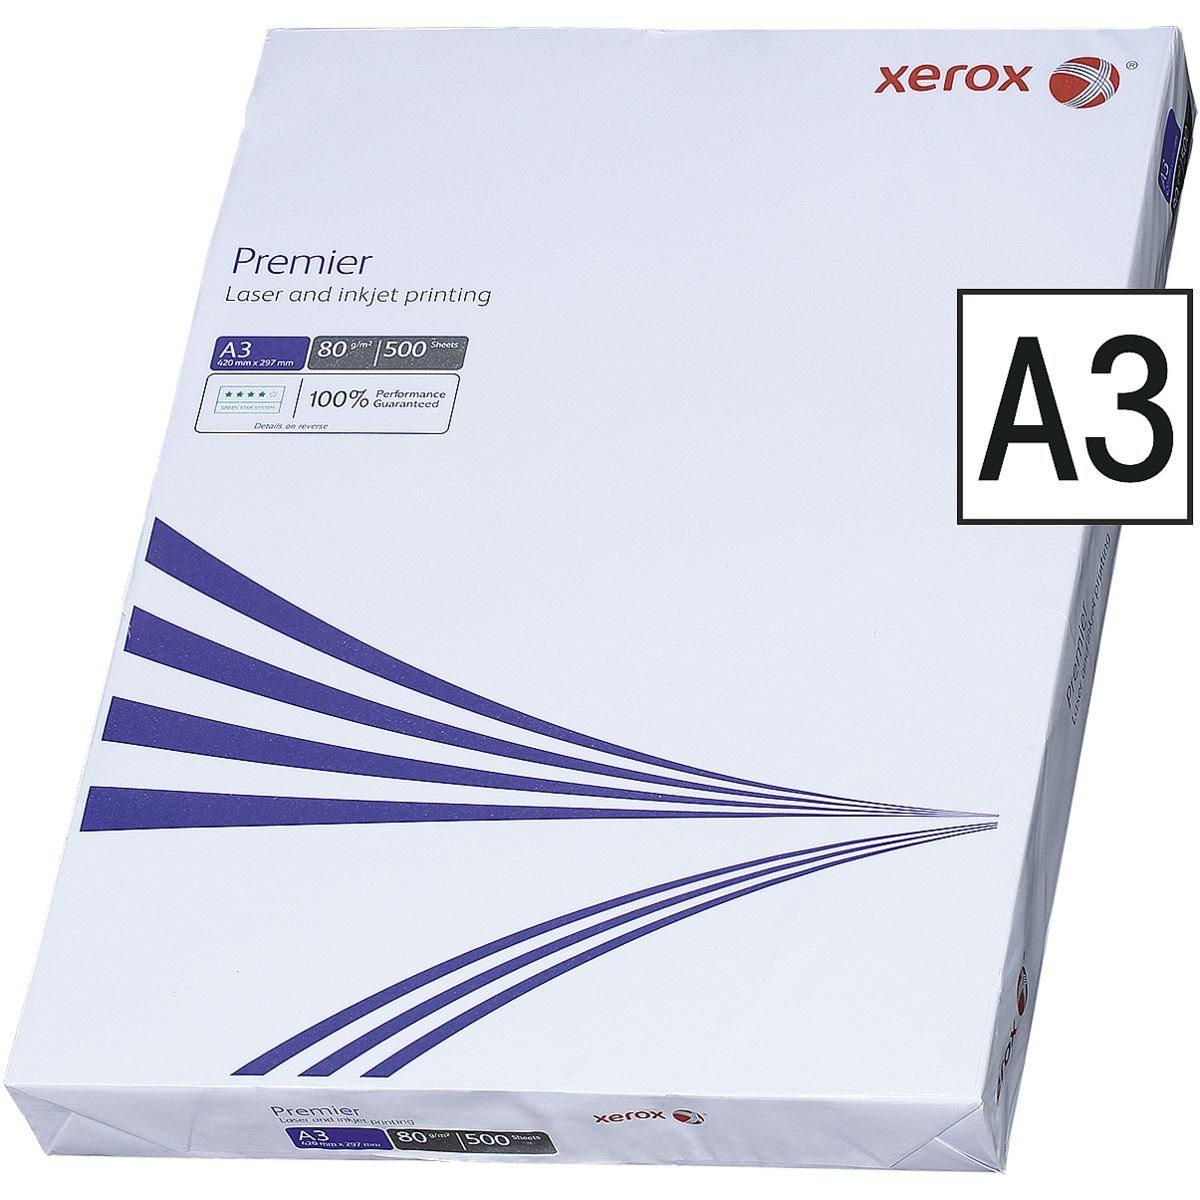 Xerox Multifunktionales Druckerpapier »Premier«